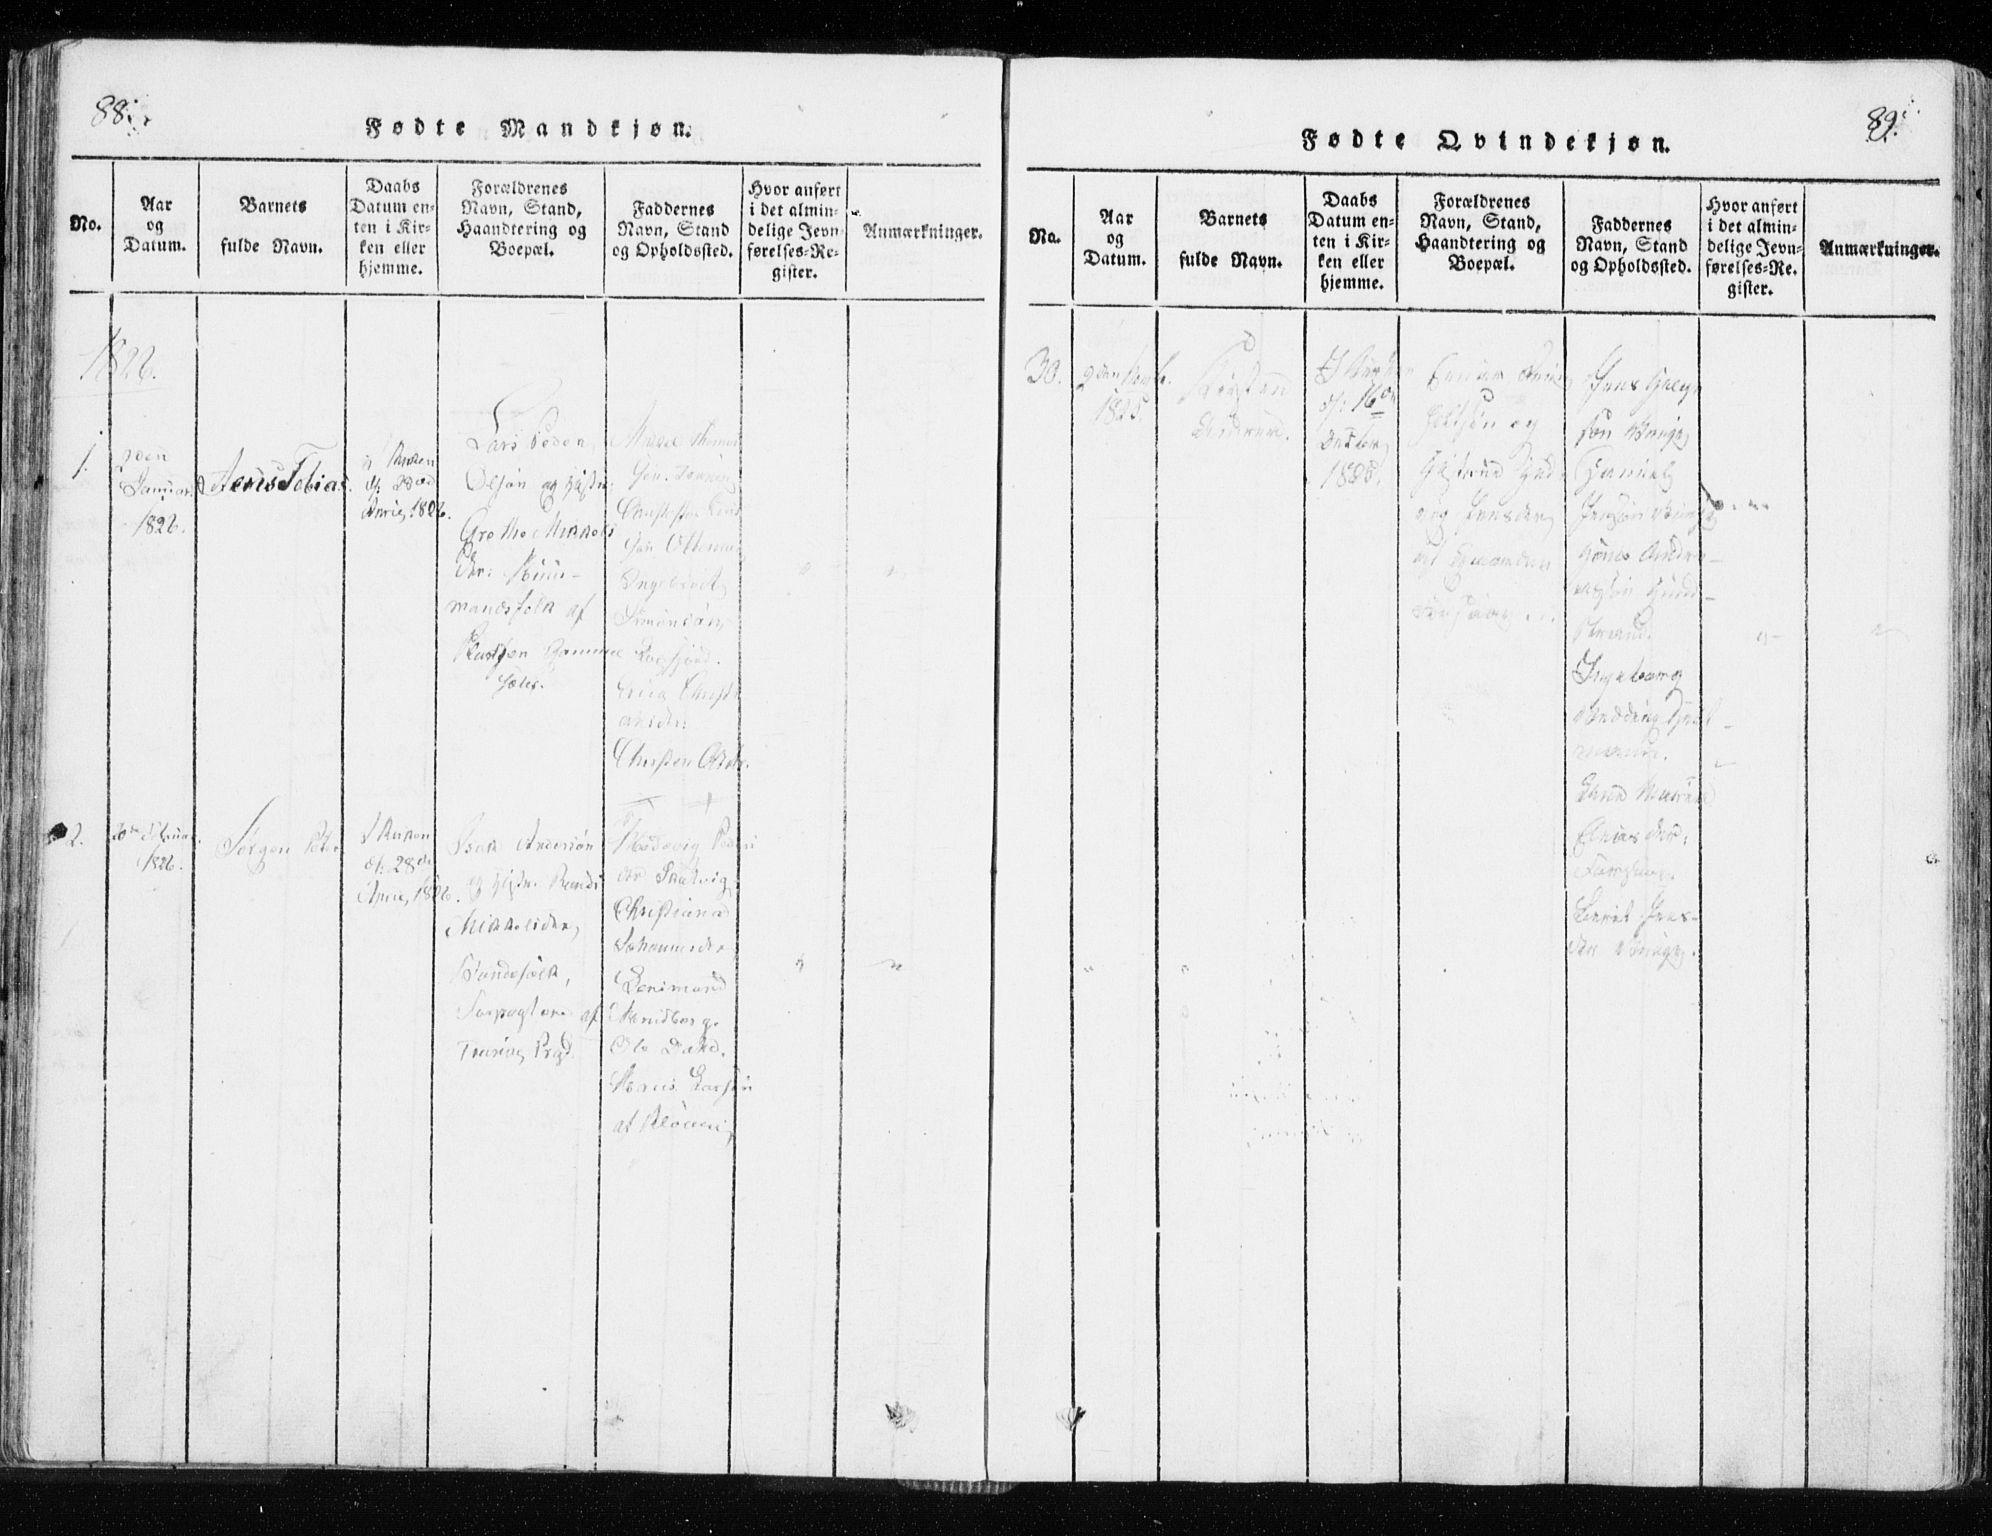 SATØ, Tranøy sokneprestkontor, I/Ia/Iaa/L0004kirke: Ministerialbok nr. 4, 1820-1829, s. 88-89